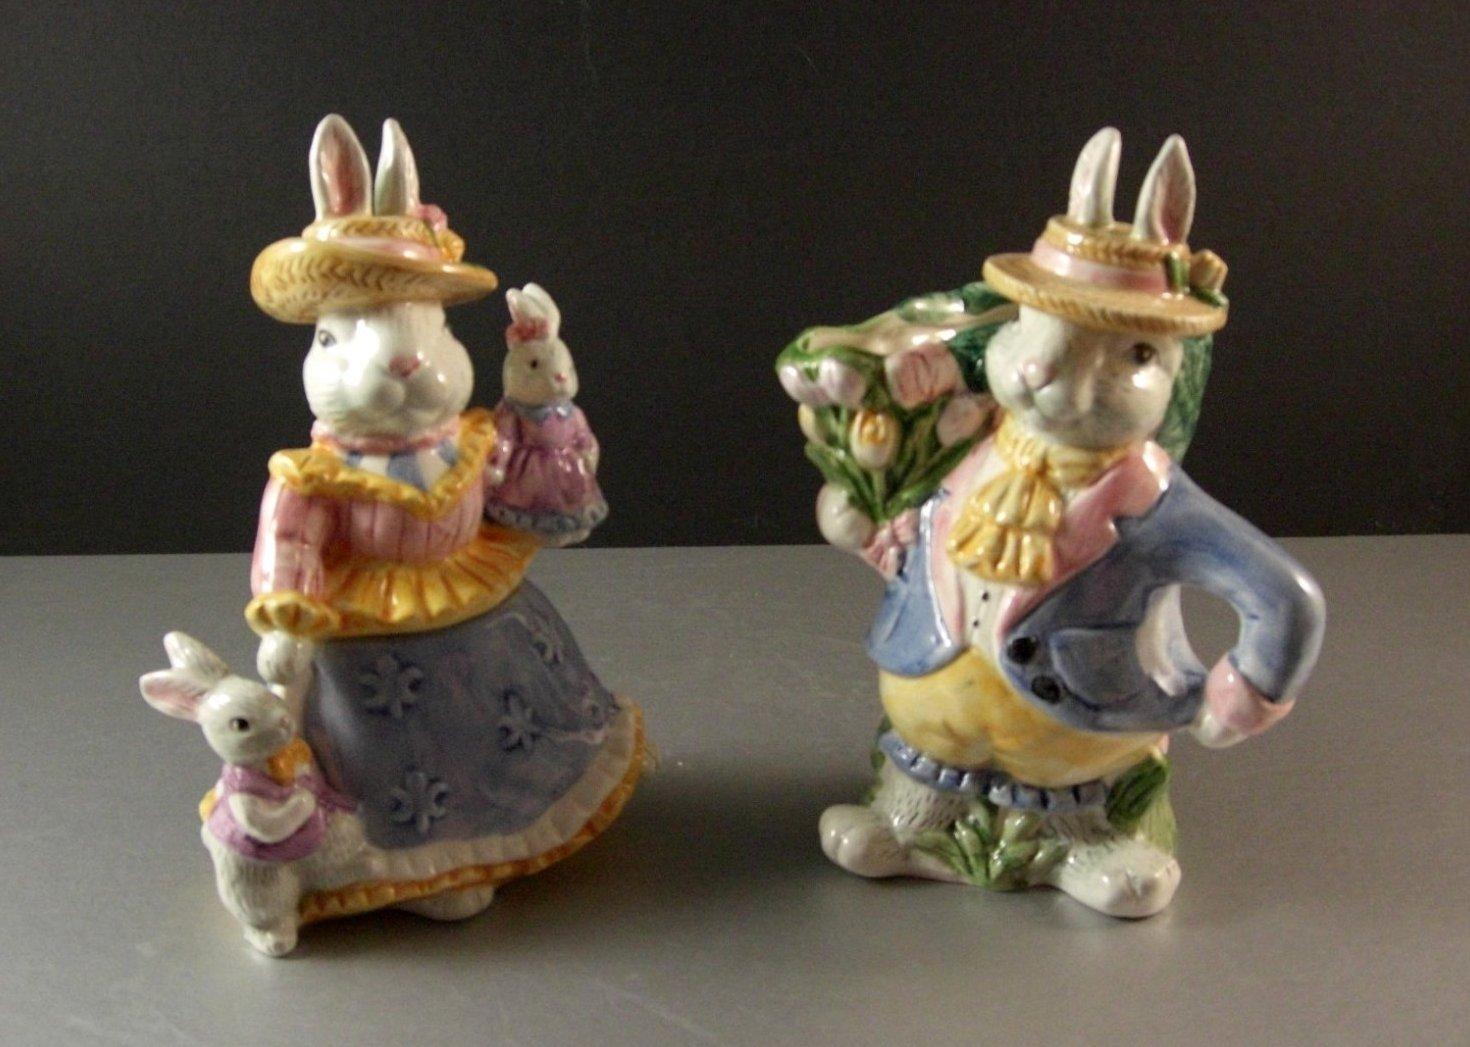 Fitz and Floyd Omnibus Versailles Rabbits Sugar and Creamer / 1994 in original b